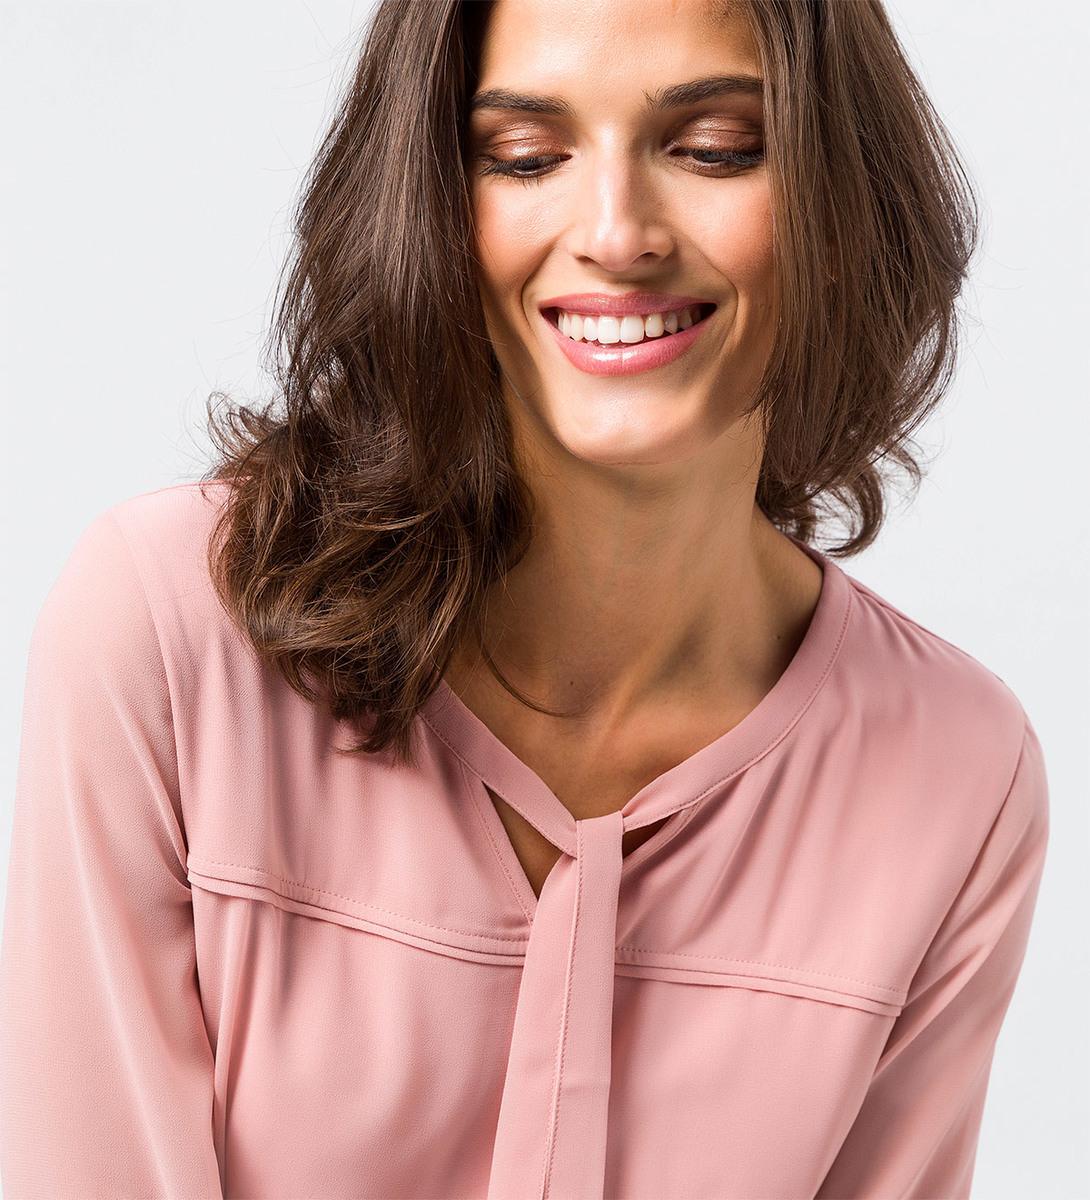 Bluse mit Bindeband in dusk rose